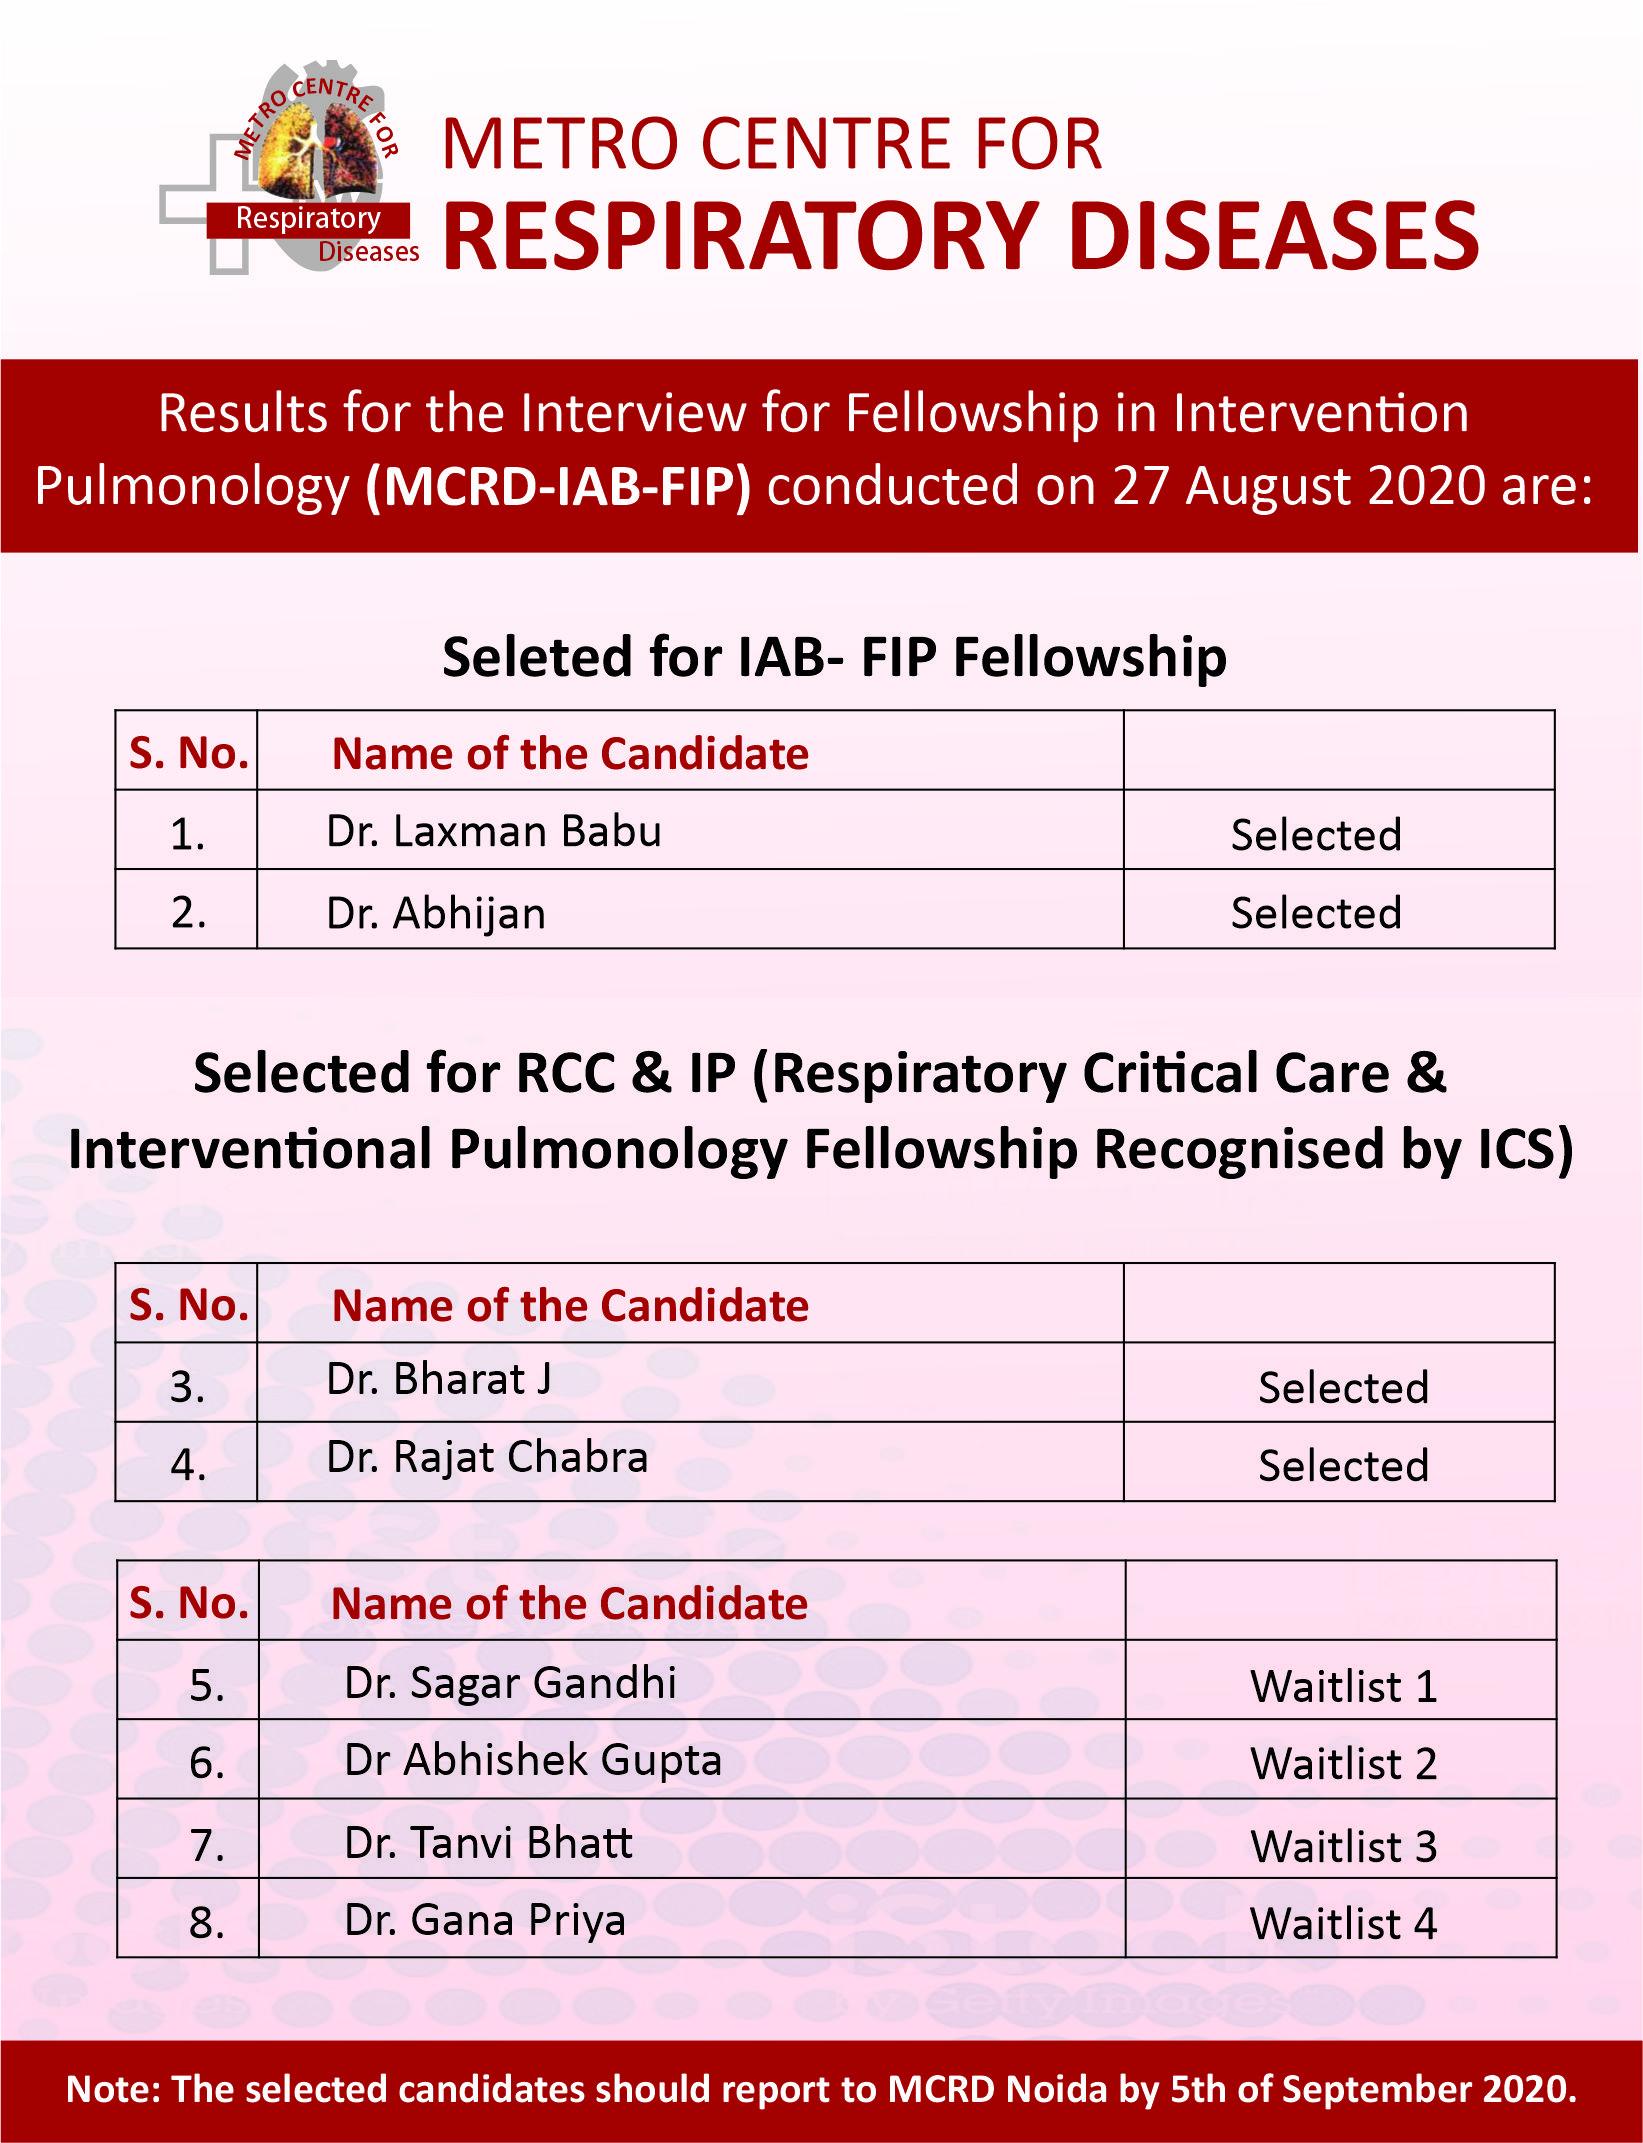 MCRD - Fellowship in Interventional Pulmonology (MCRD - FIP)